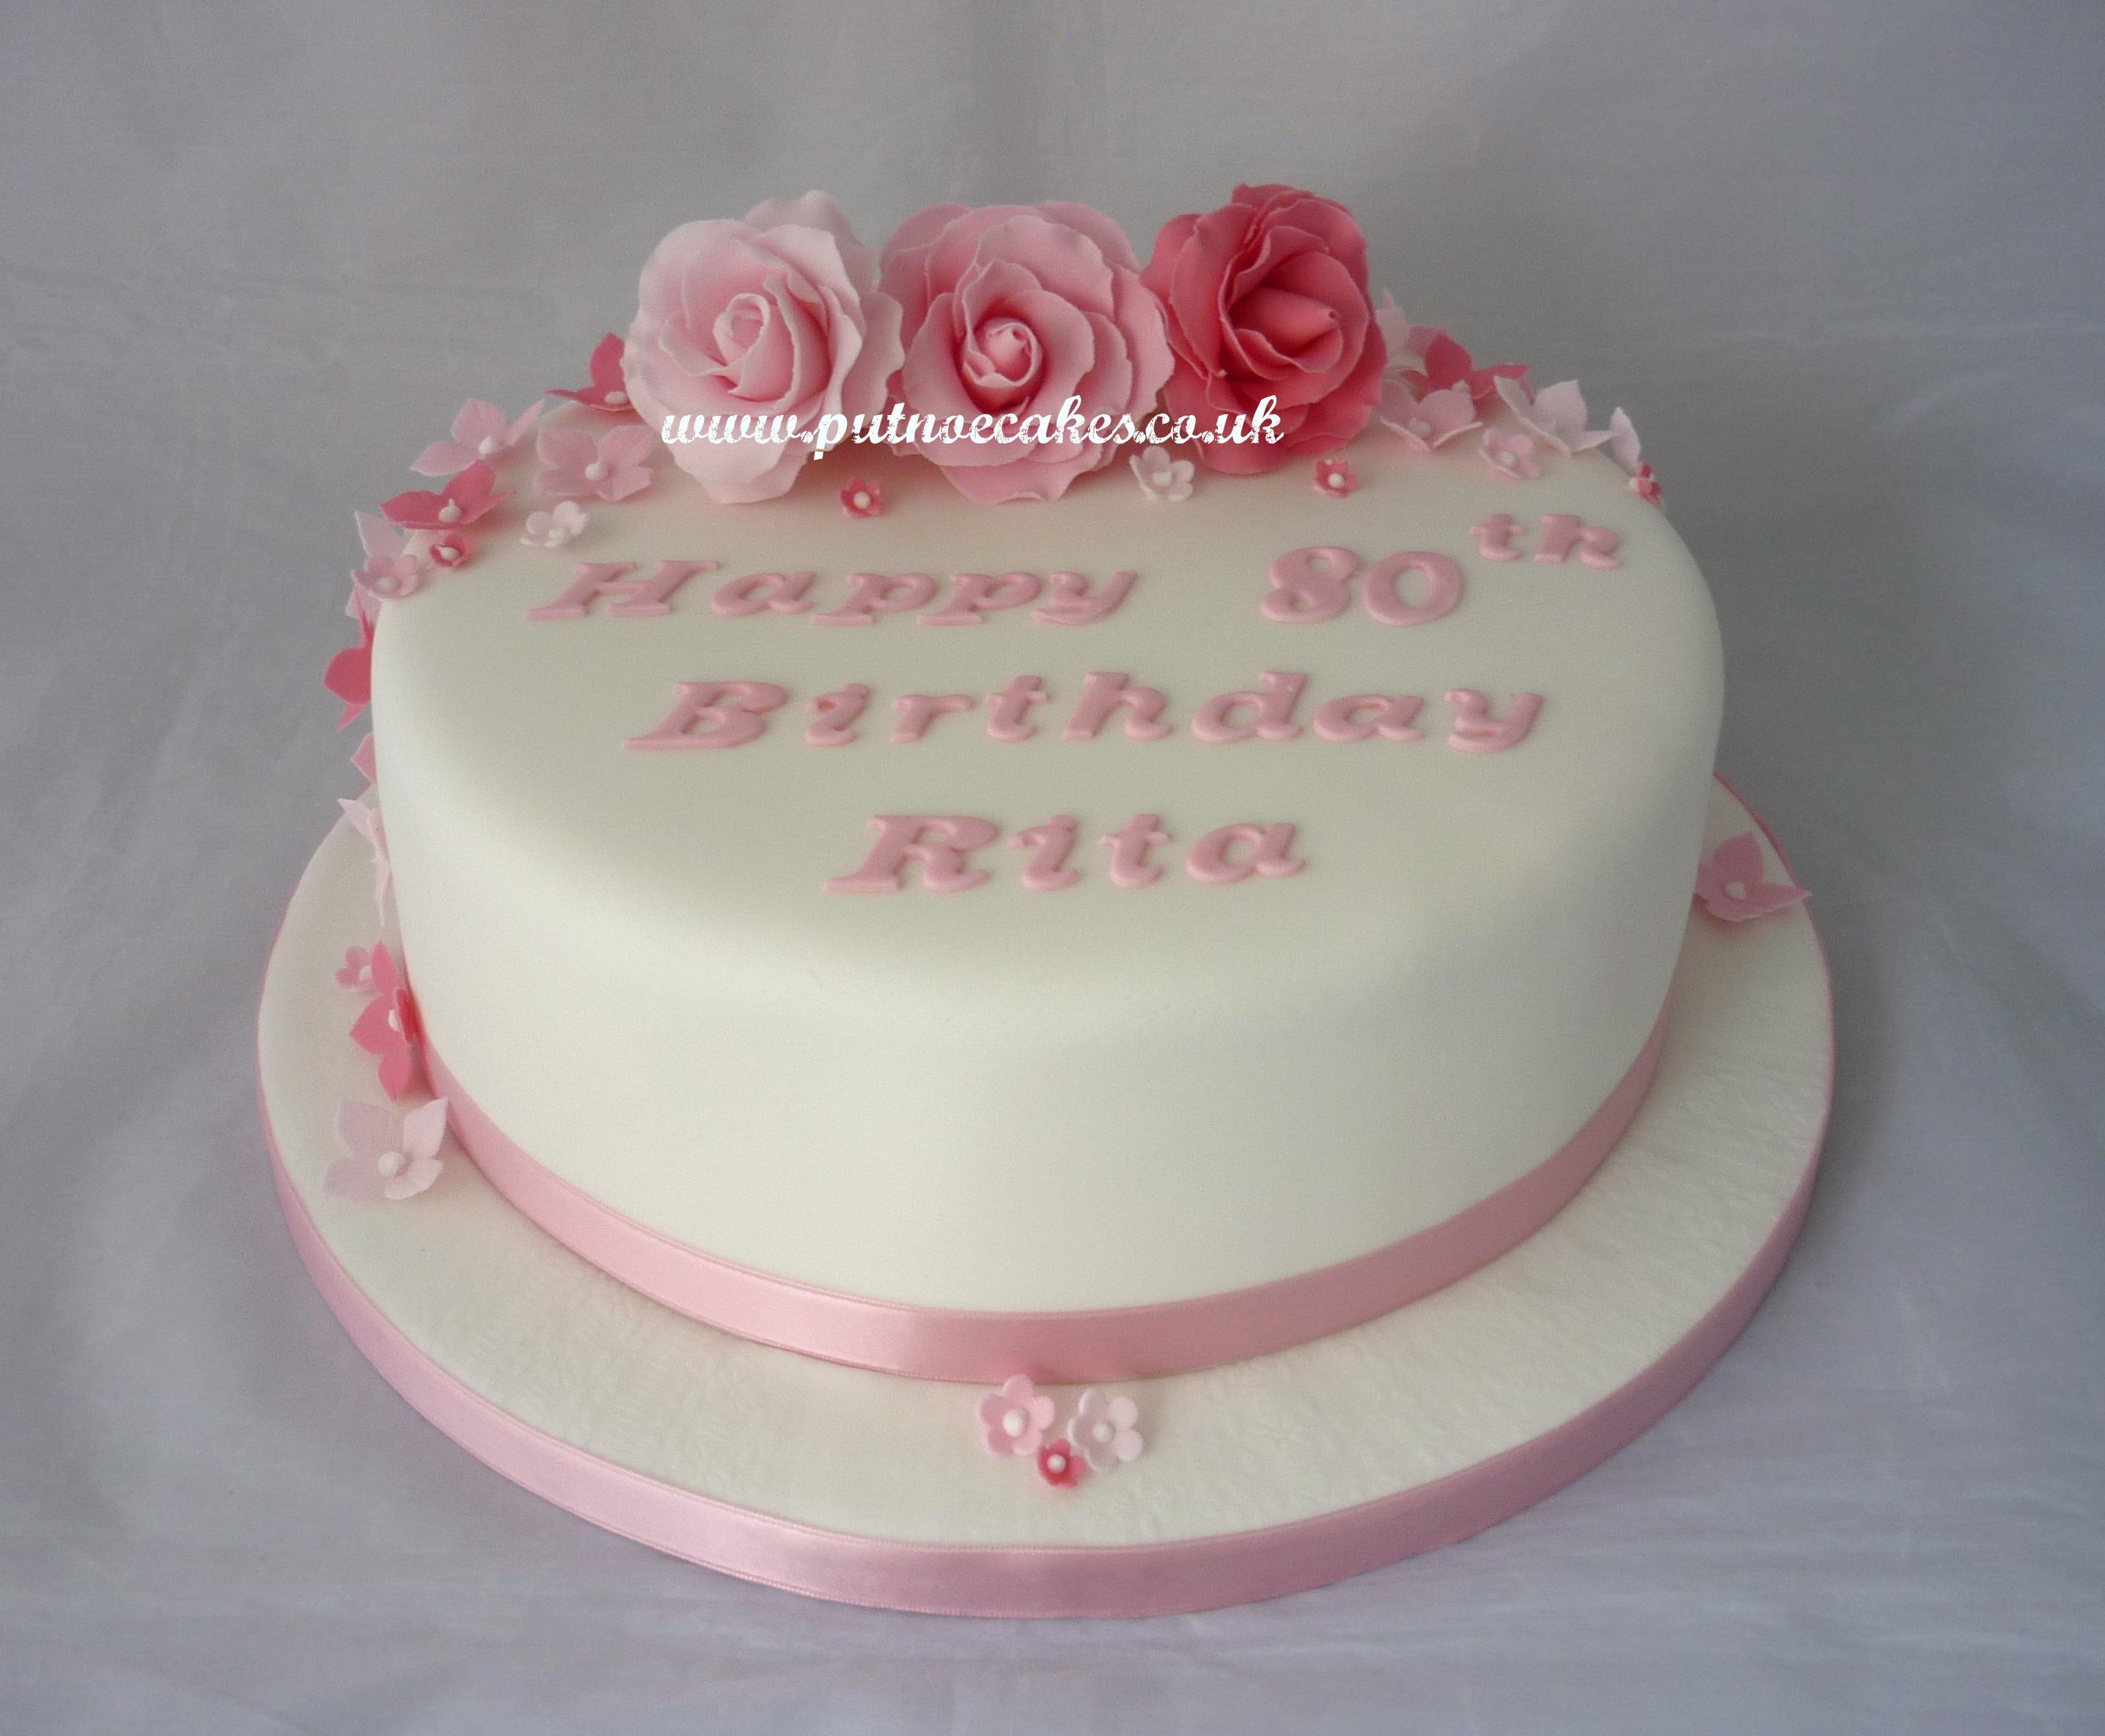 60th Birthday Cake Cakes 60 Female New Decorating Ideas